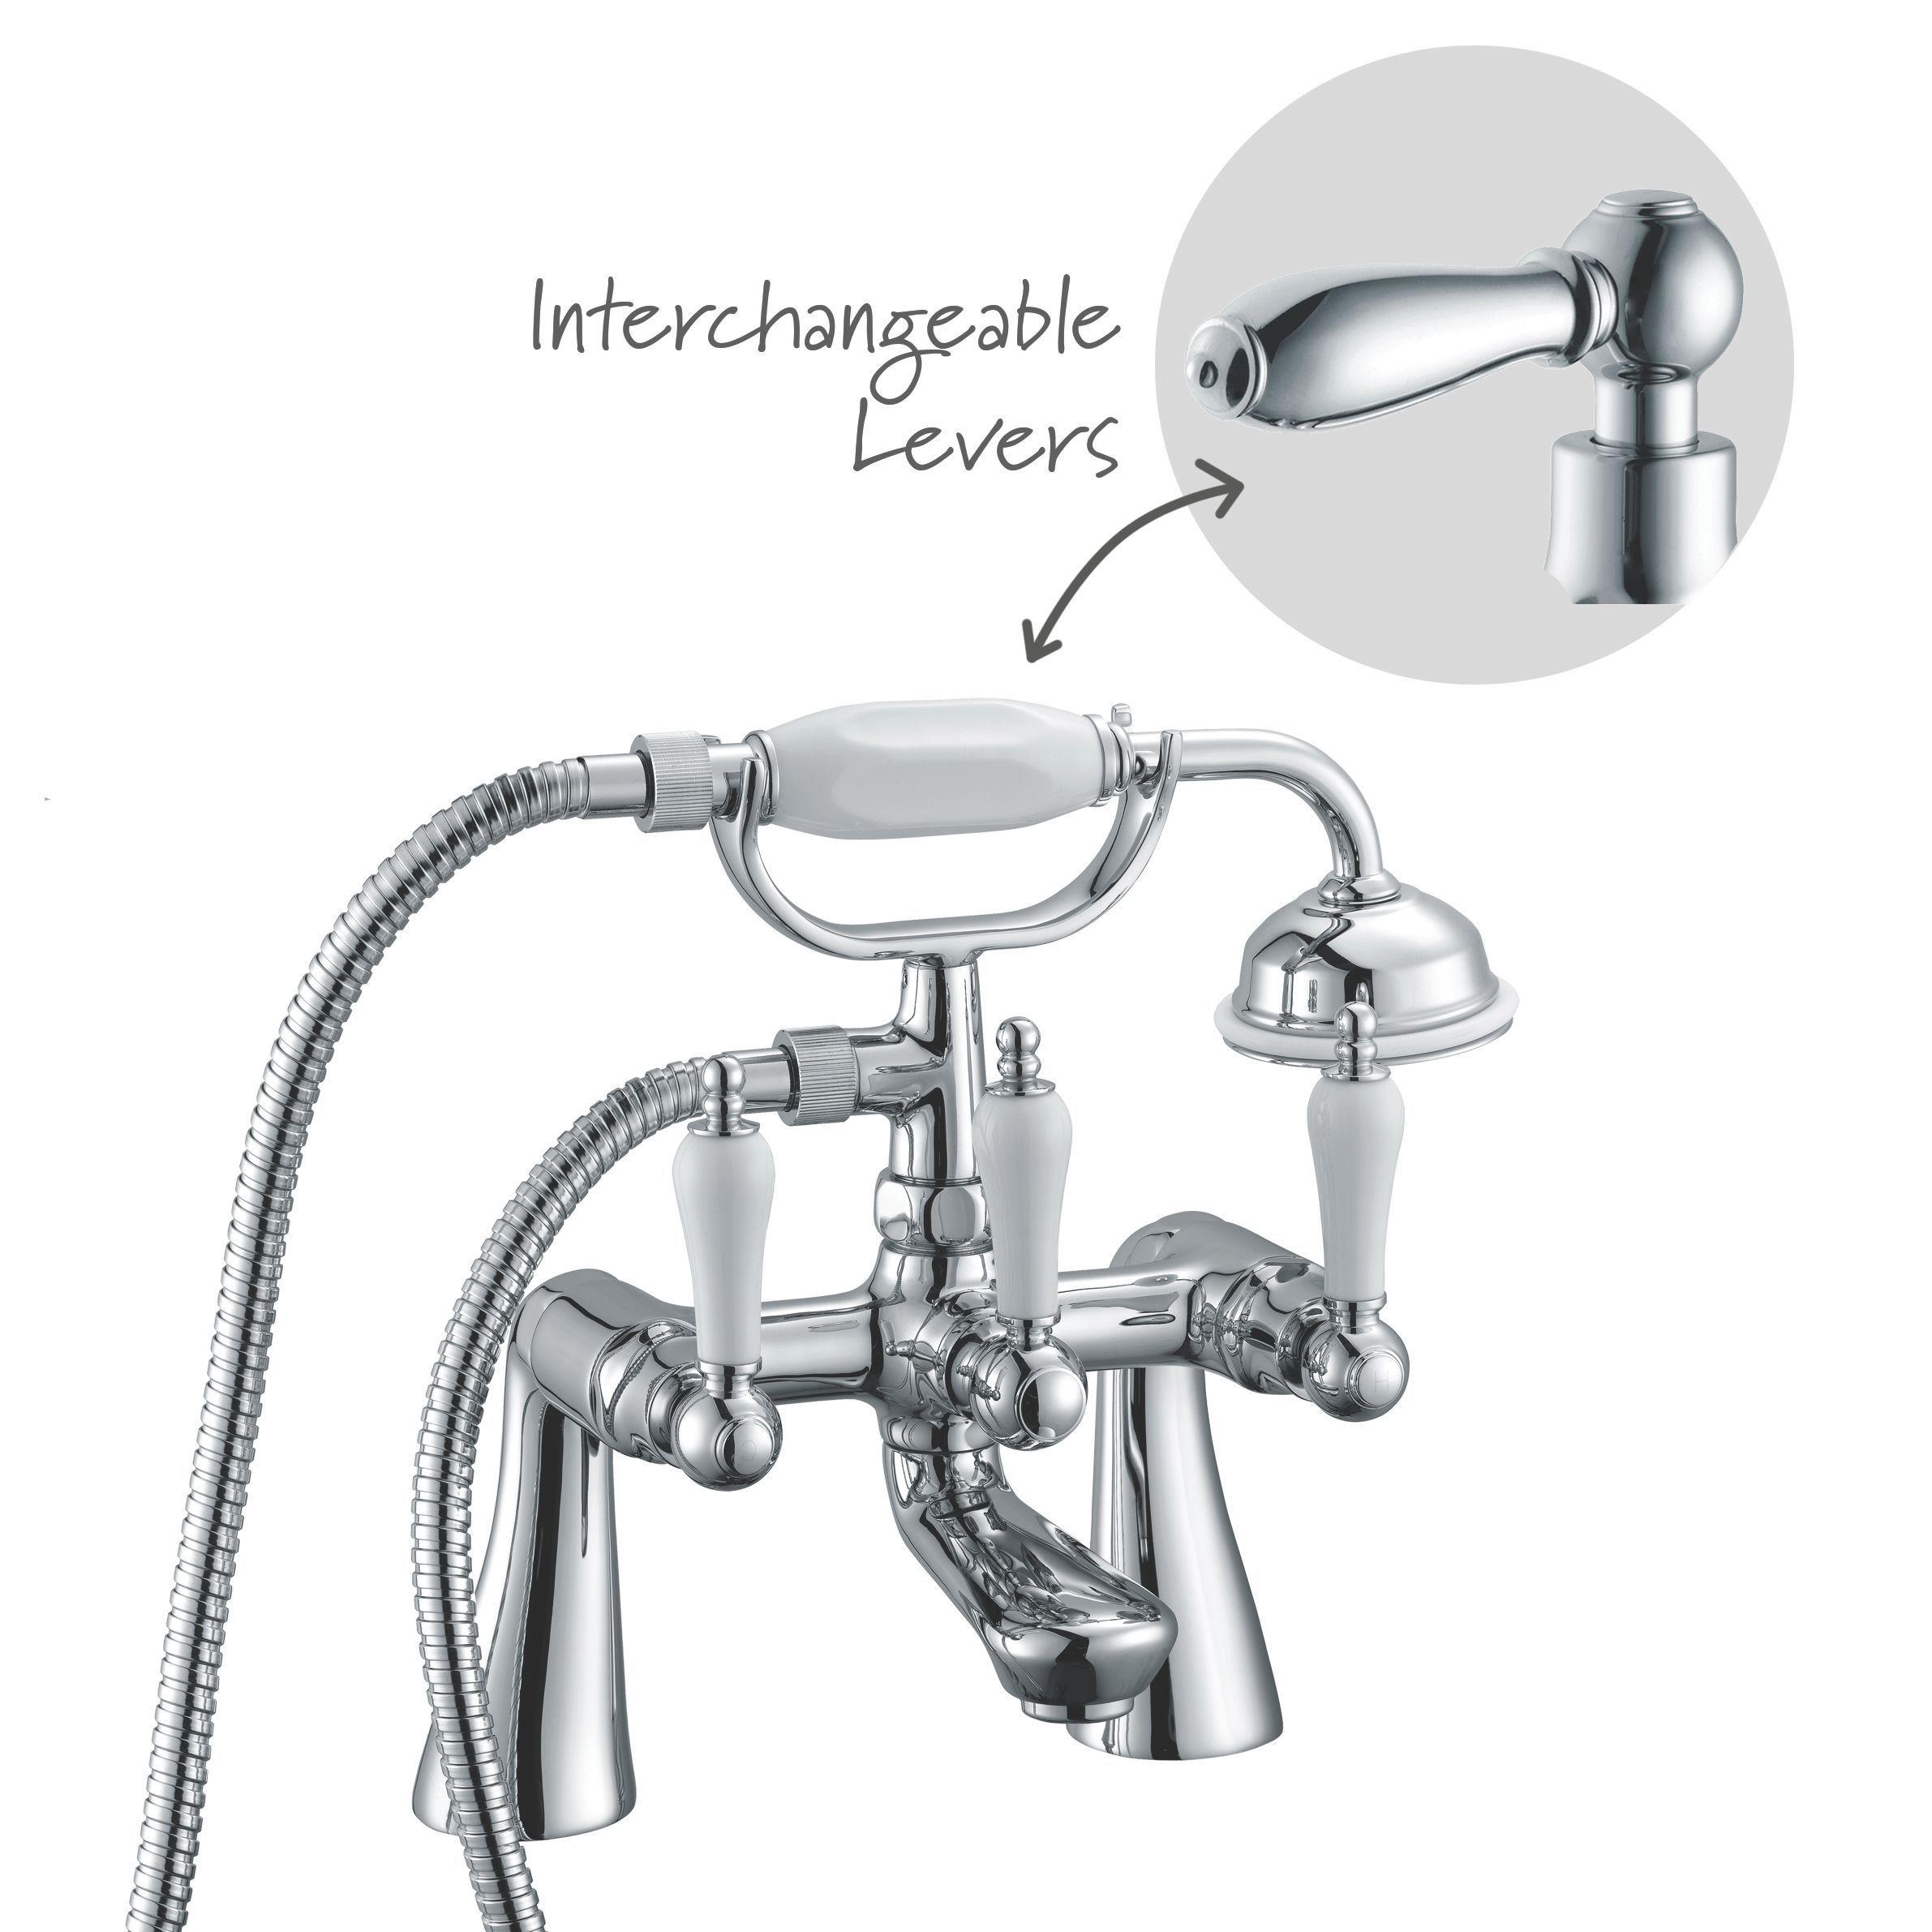 cooke lewis timeless chrome bath shower mixer tap departments cooke lewis timeless chrome bath shower mixer tap departments diy at b q